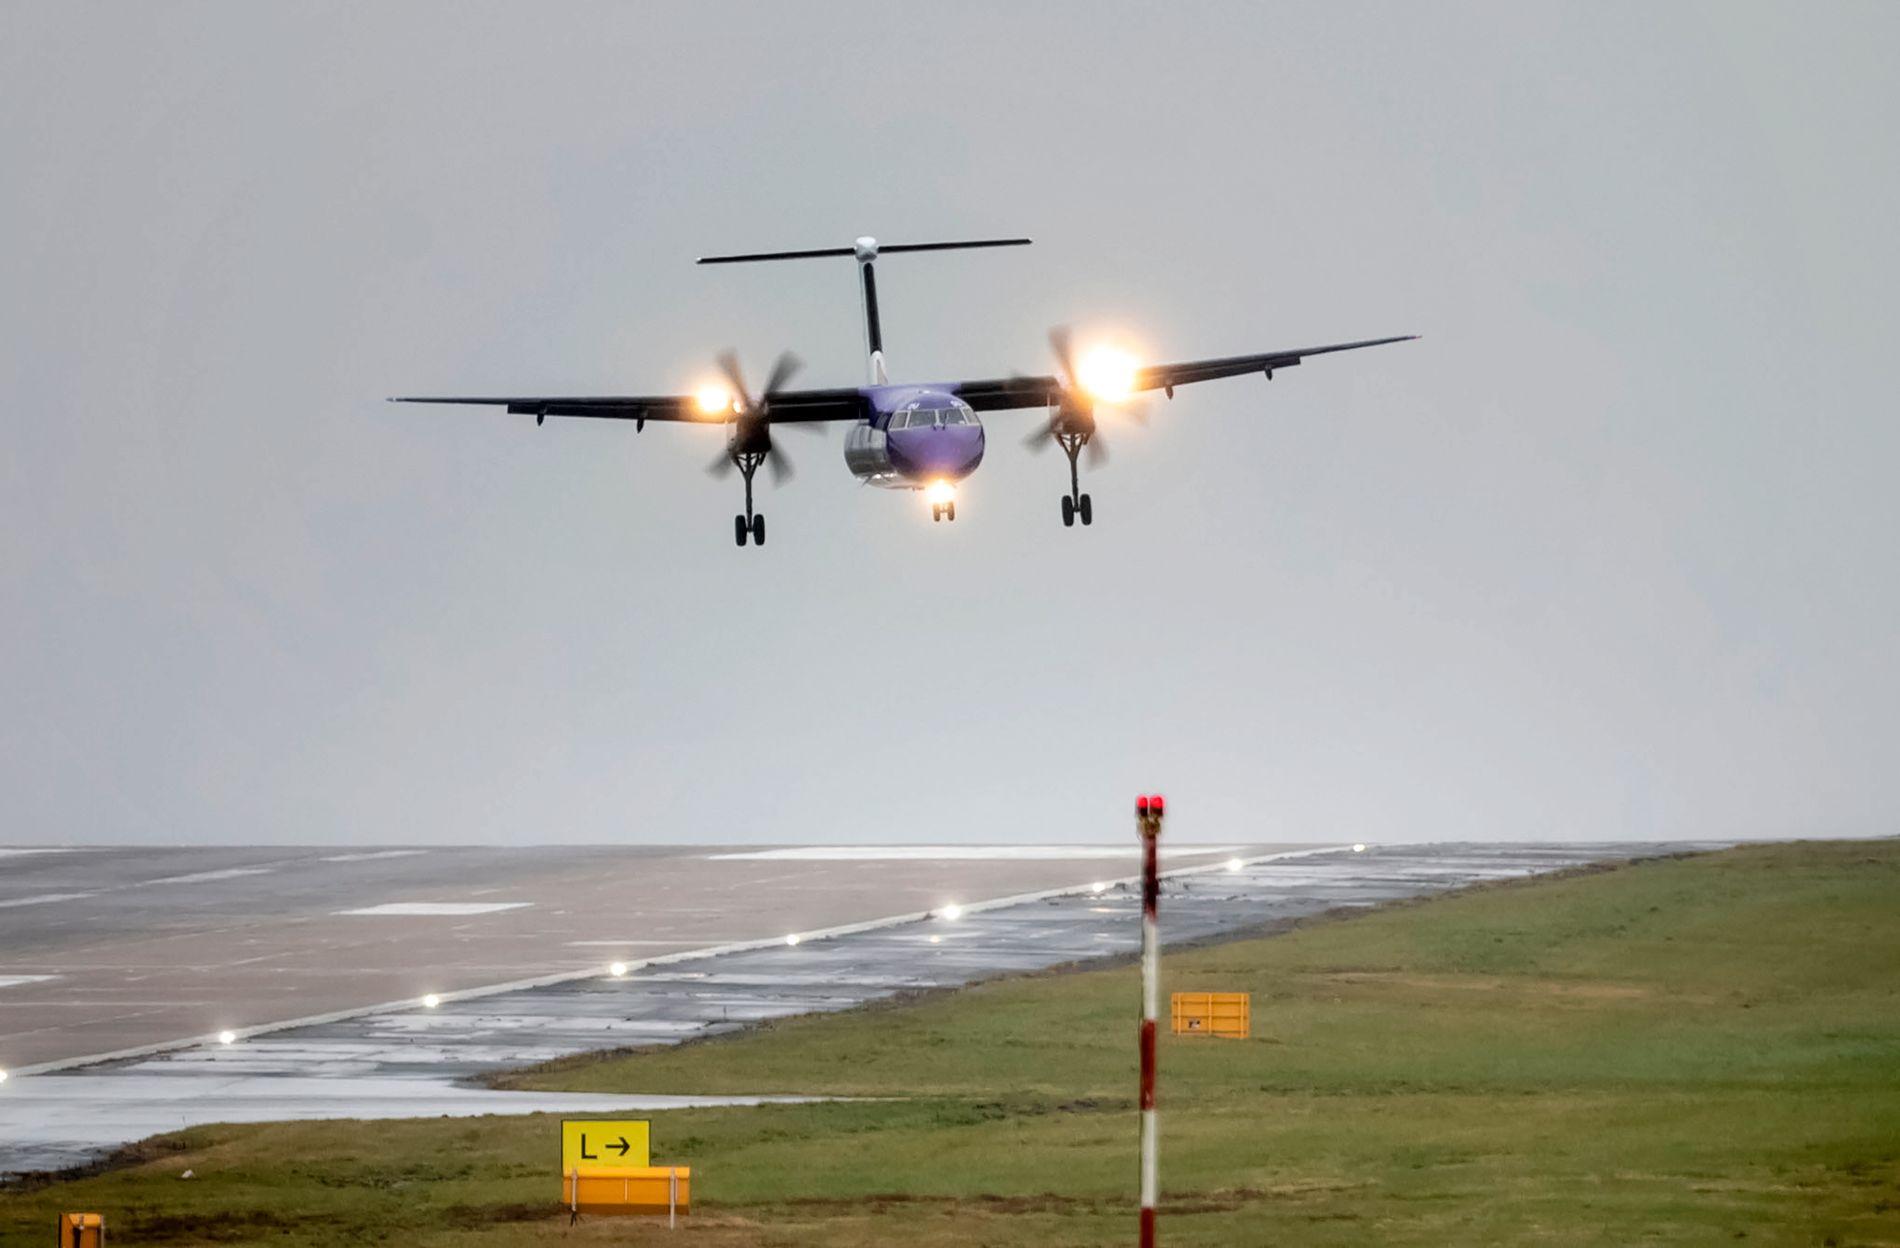 UUPSS! Slik så det ut da et fly landet i svært sterk sidevind på Leeds Bradford Airport i Yorkshire i formiddag, da stormen «Gareth» traff Storbritannia.